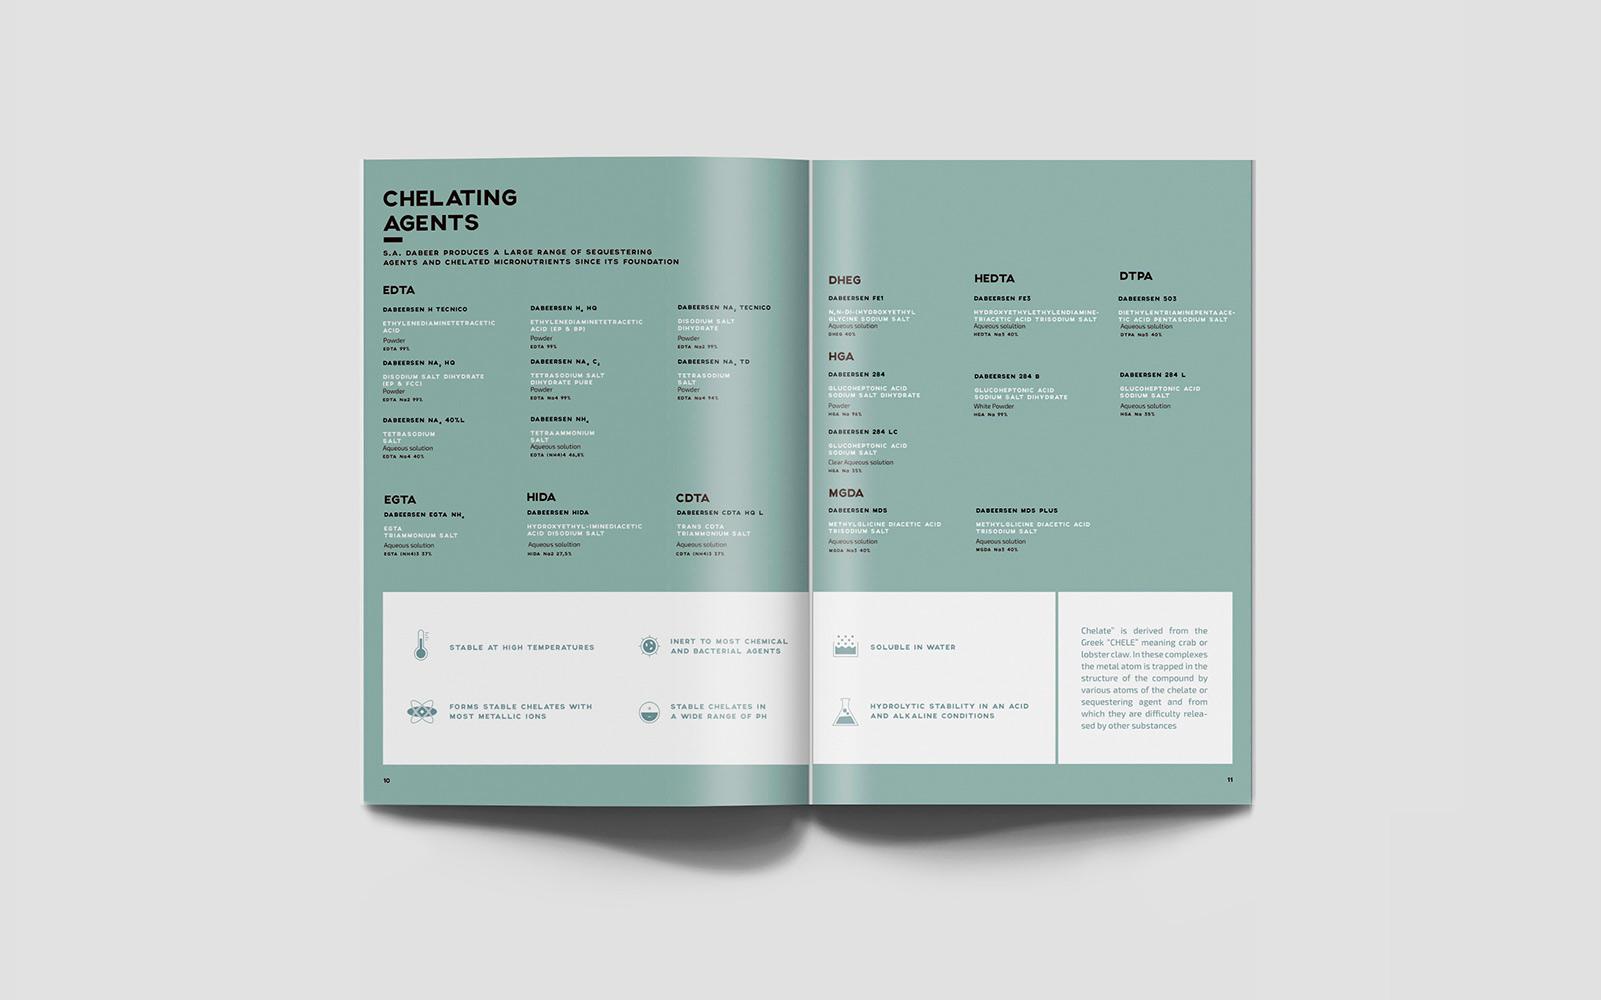 diseño grafico  Catálogo corporativo     7